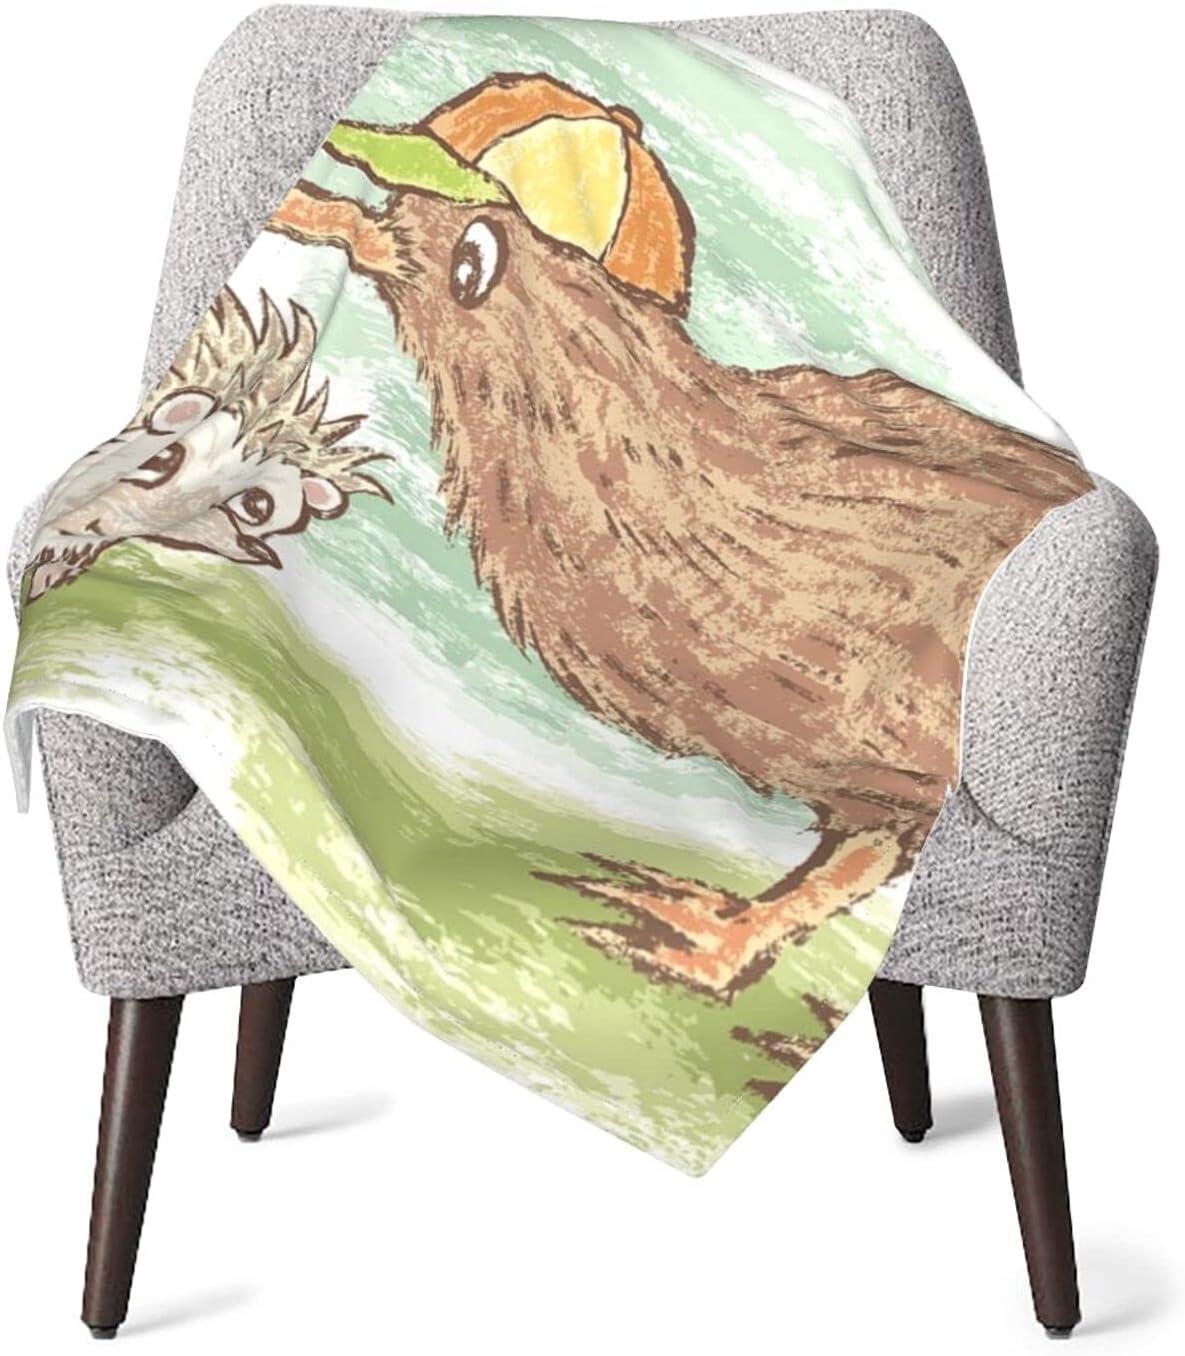 Kiwi Bird and Hedgehog Boys Girls 40 x Max 41% OFF 30 Blanket List price Inche Baby